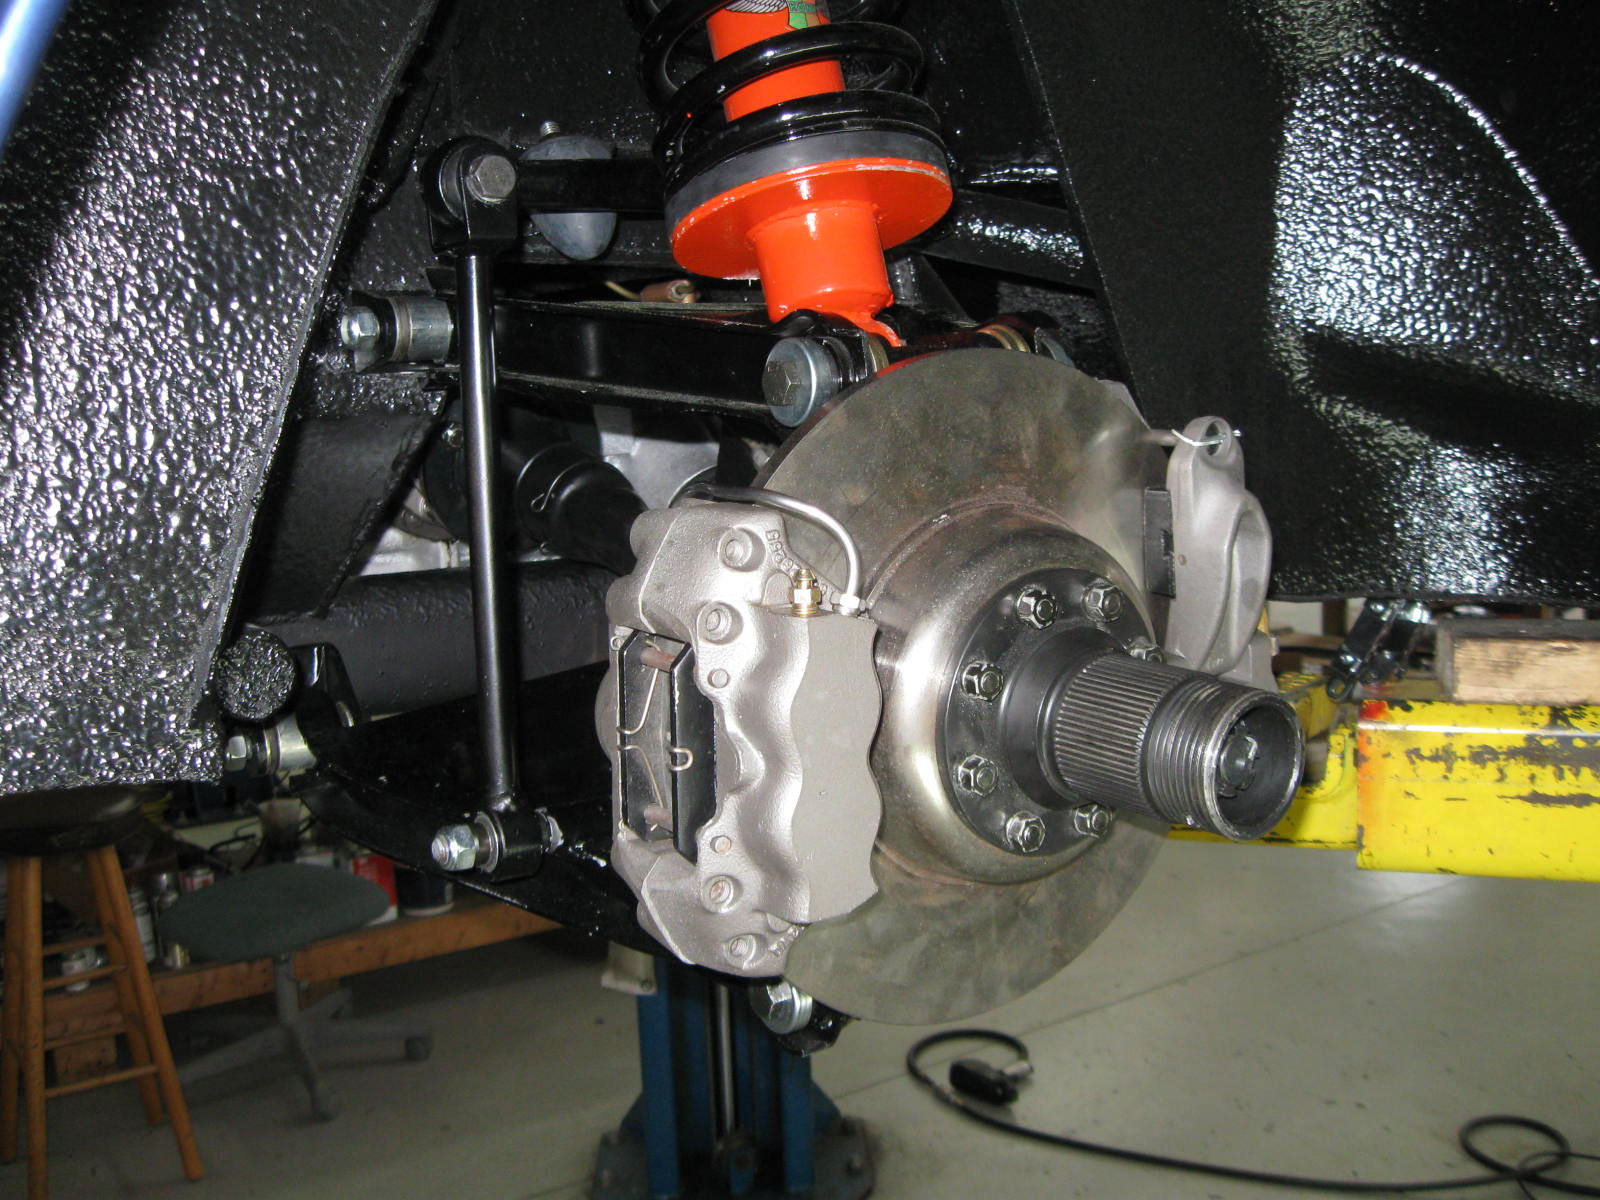 Ferrari 330 GTC brakes